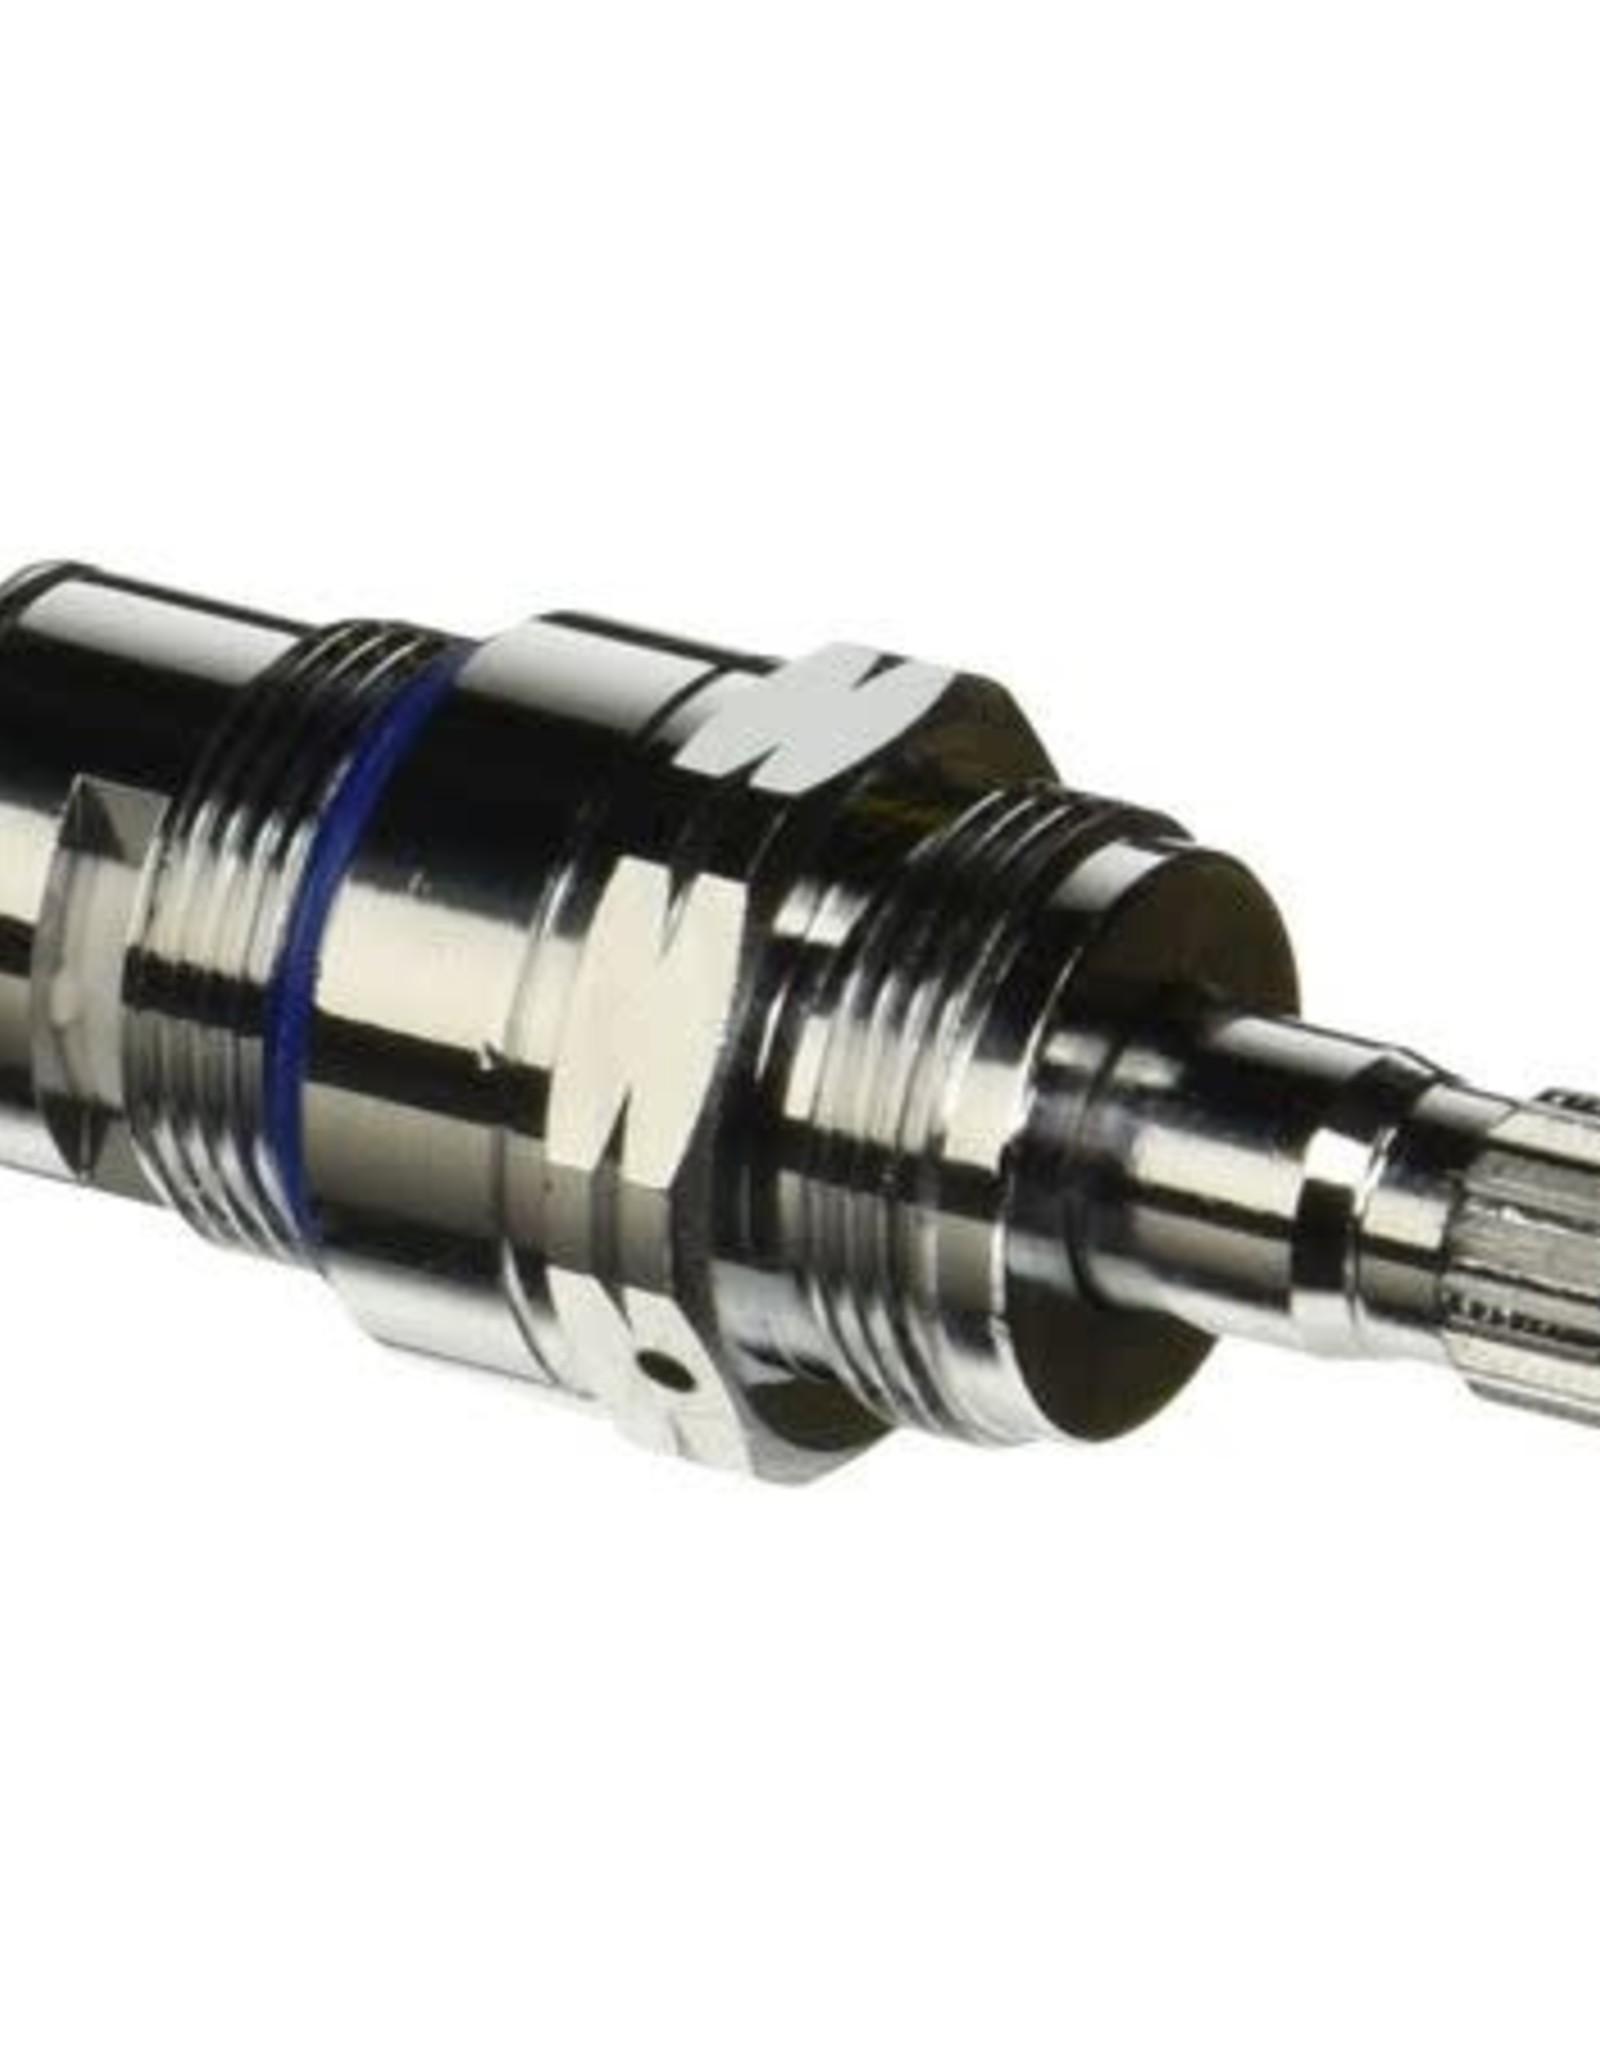 Master Plumber Delta Cer-Teck Left Hand Cartridge